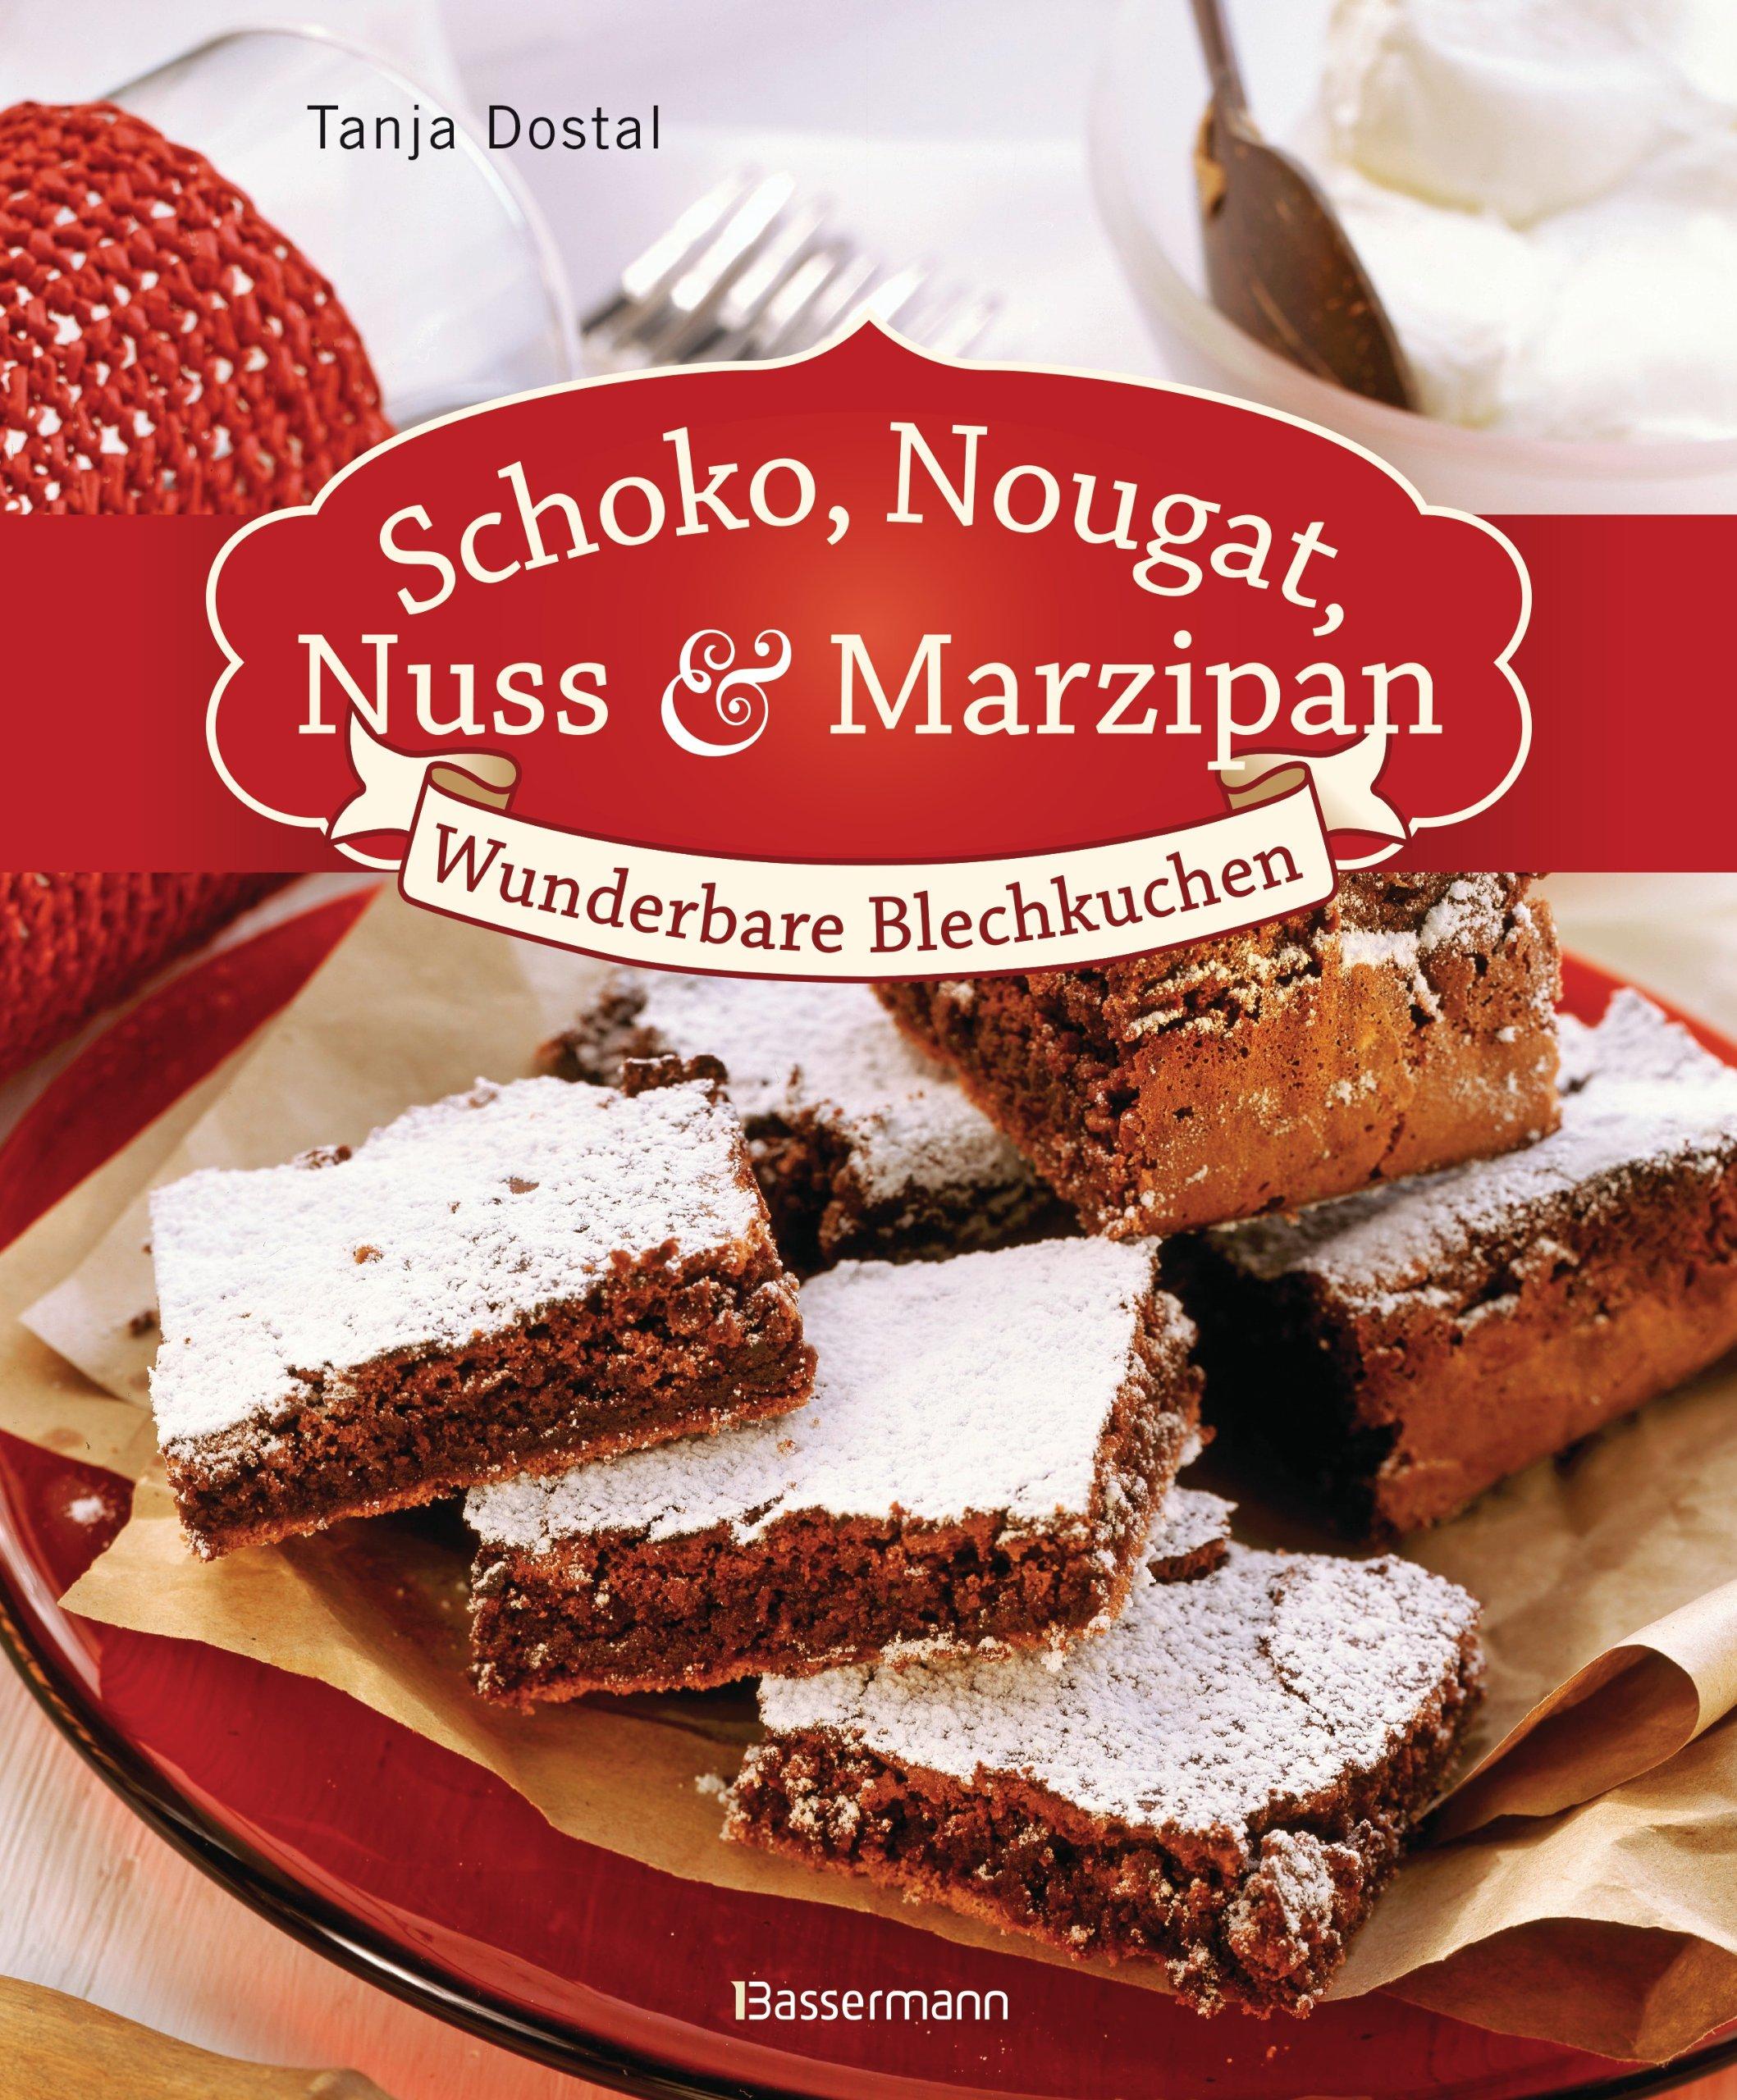 Schoko Nougat Nuss Und Marzipan Wunderbare Blechkuchen Amazonde